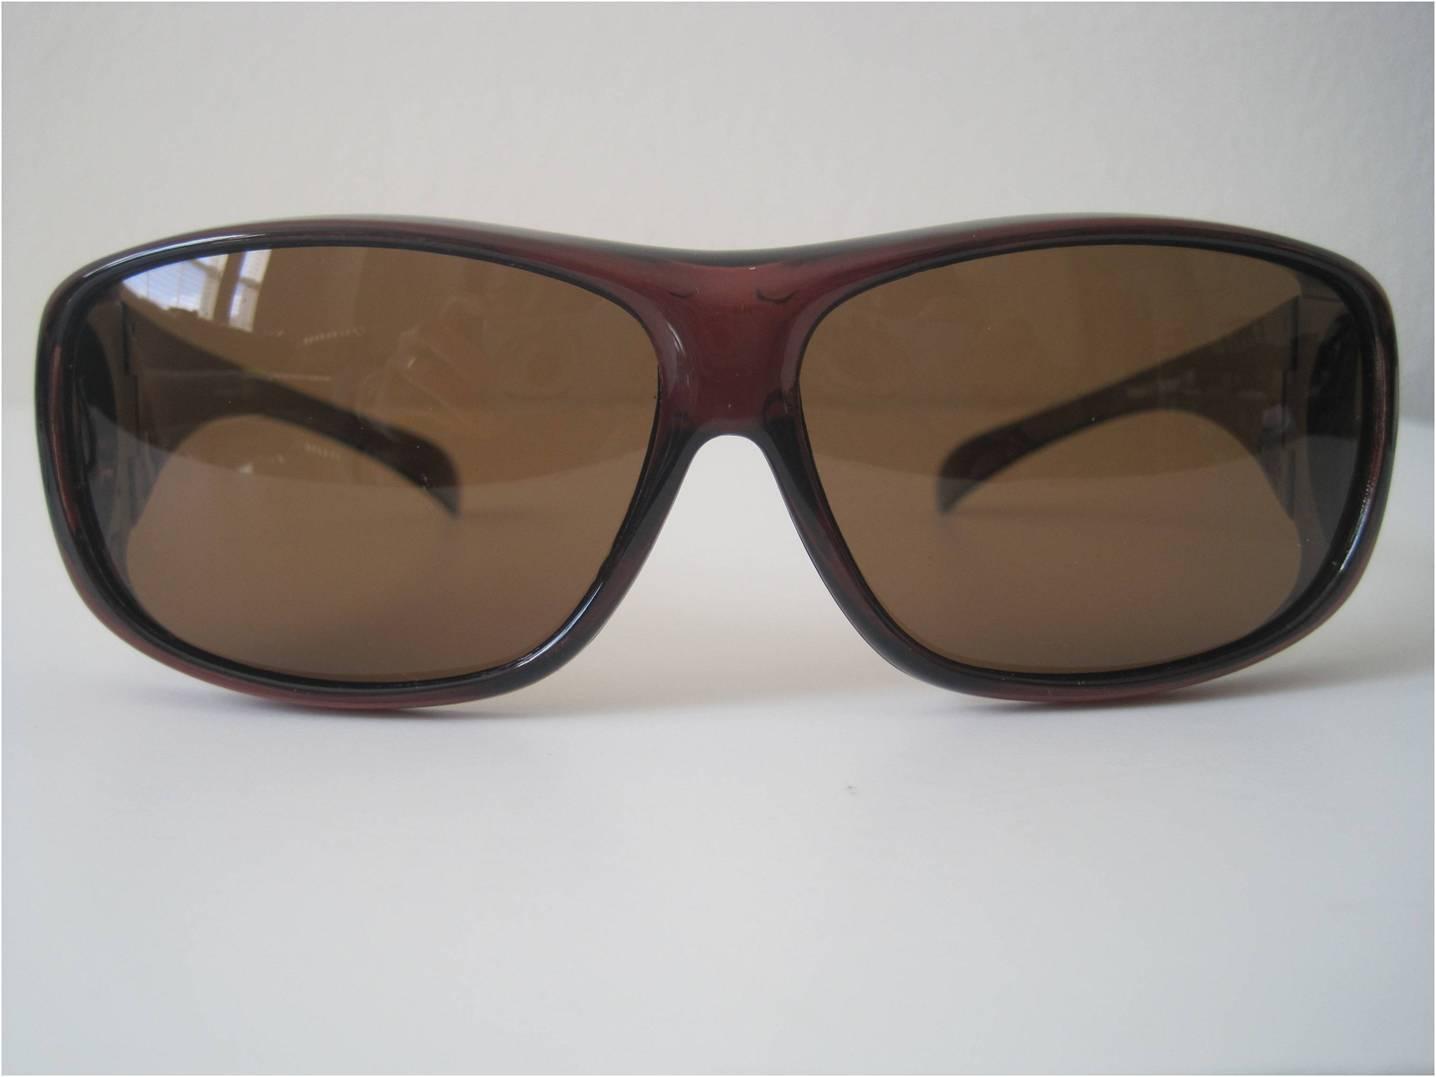 Clear bw polarized sunglasses wear put cover over rx for Prescription fishing sunglasses